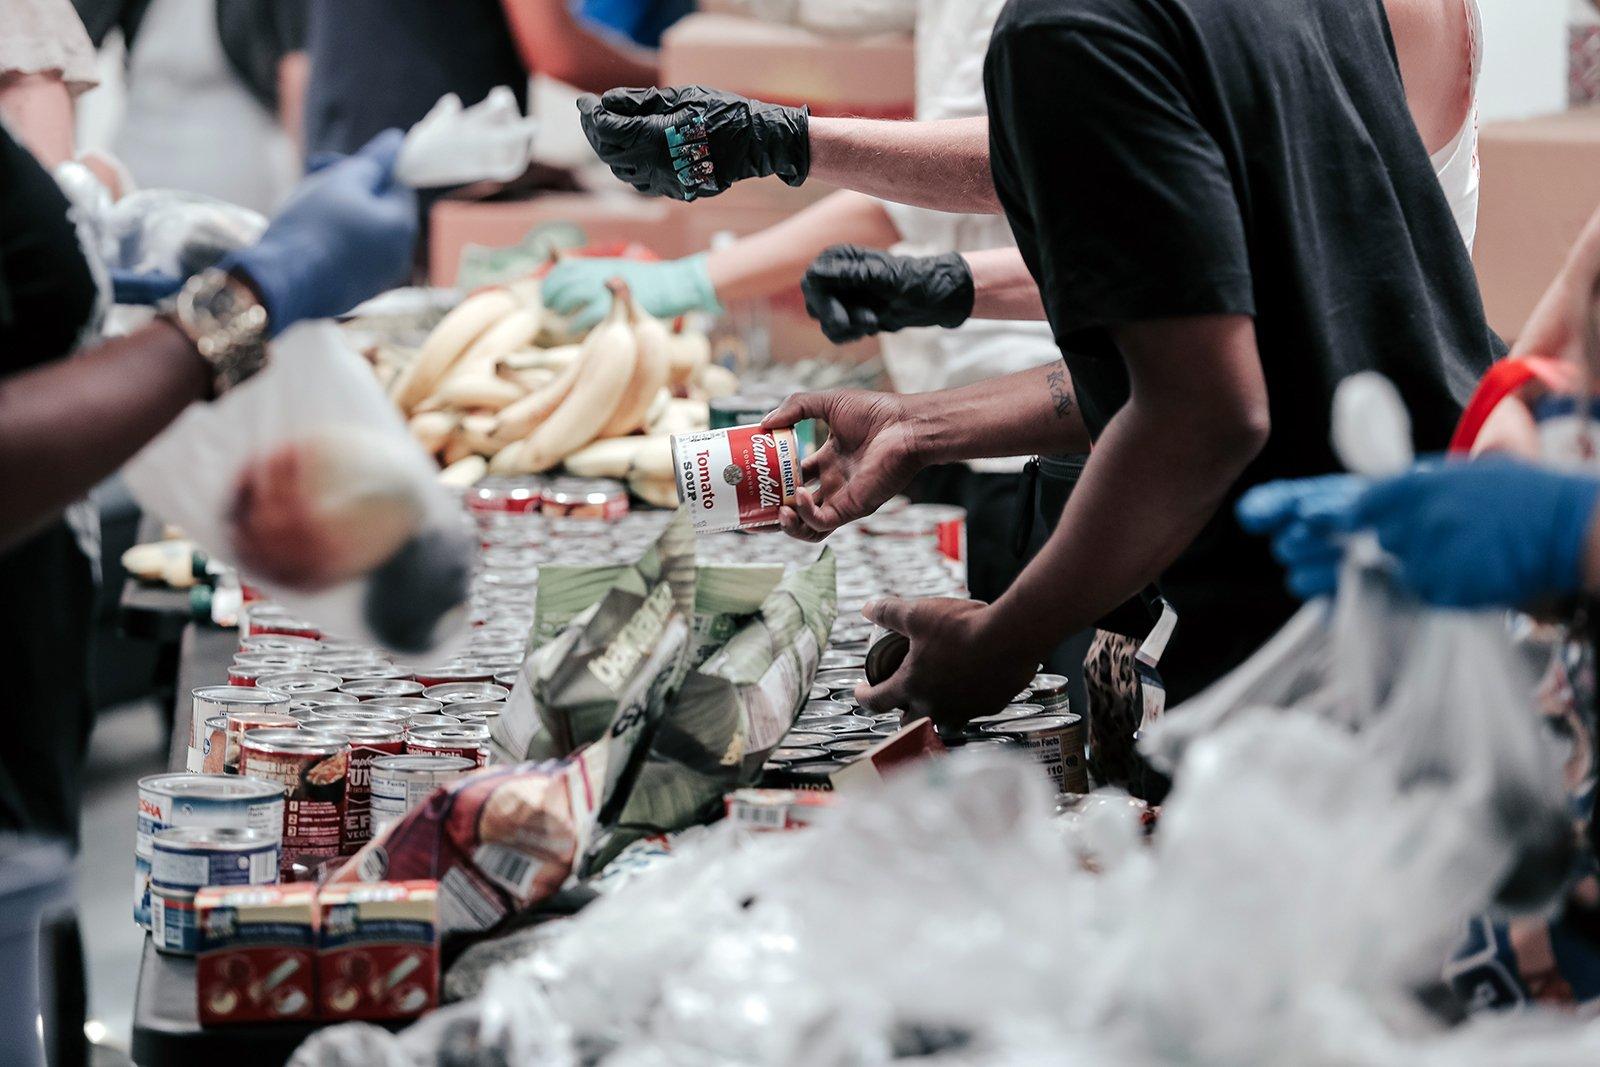 Community members work together organizing food donations. Photo by Joel Muniz/Unsplash/Creative Commons